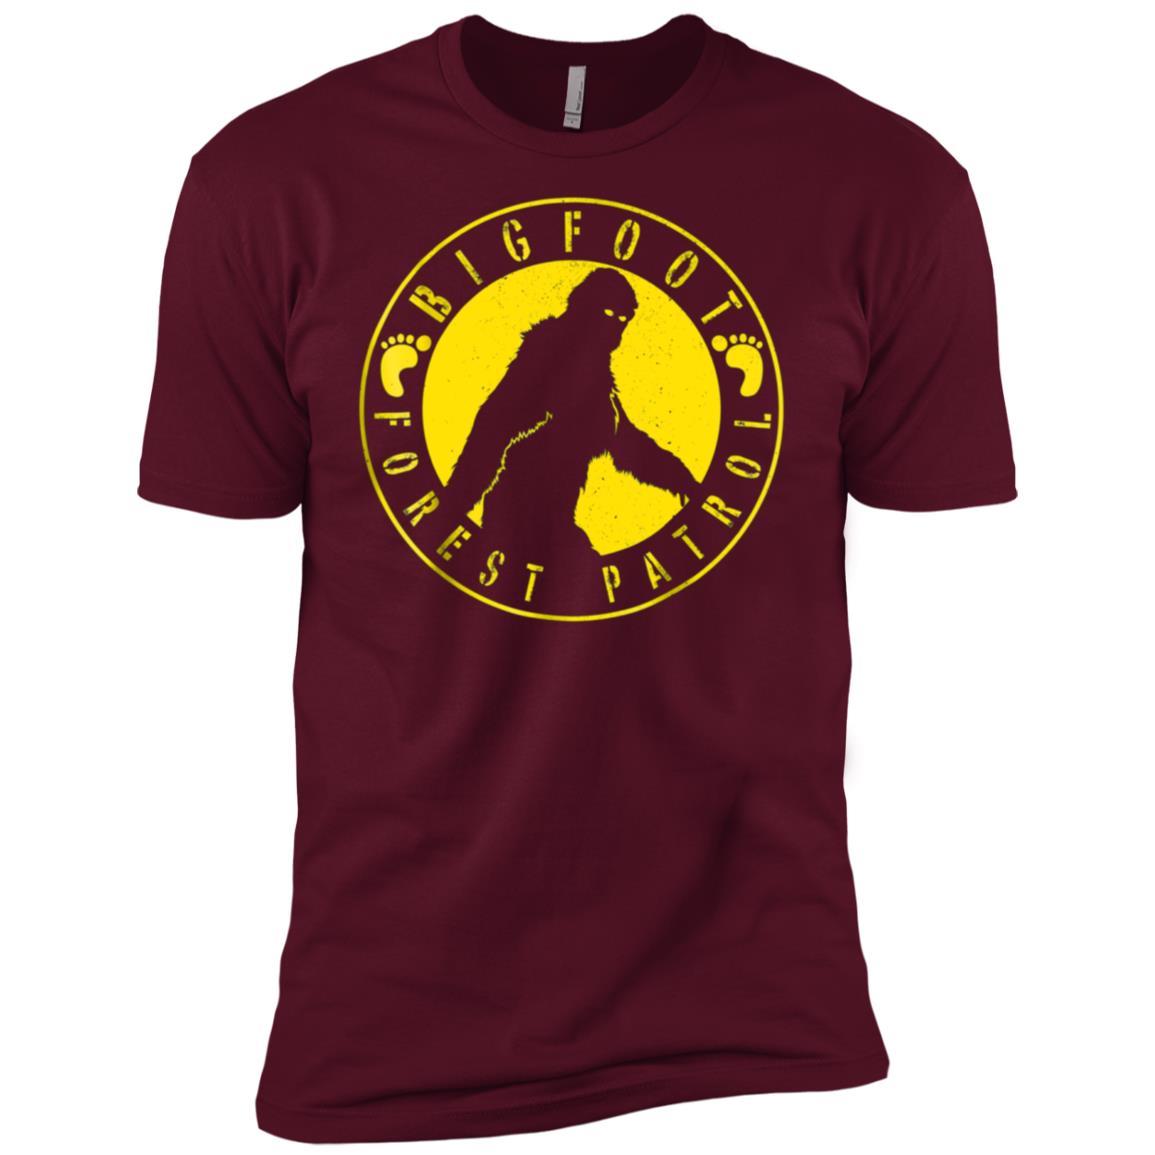 Bigfoot Forest Patrol Badge Graphic Men Short Sleeve T-Shirt